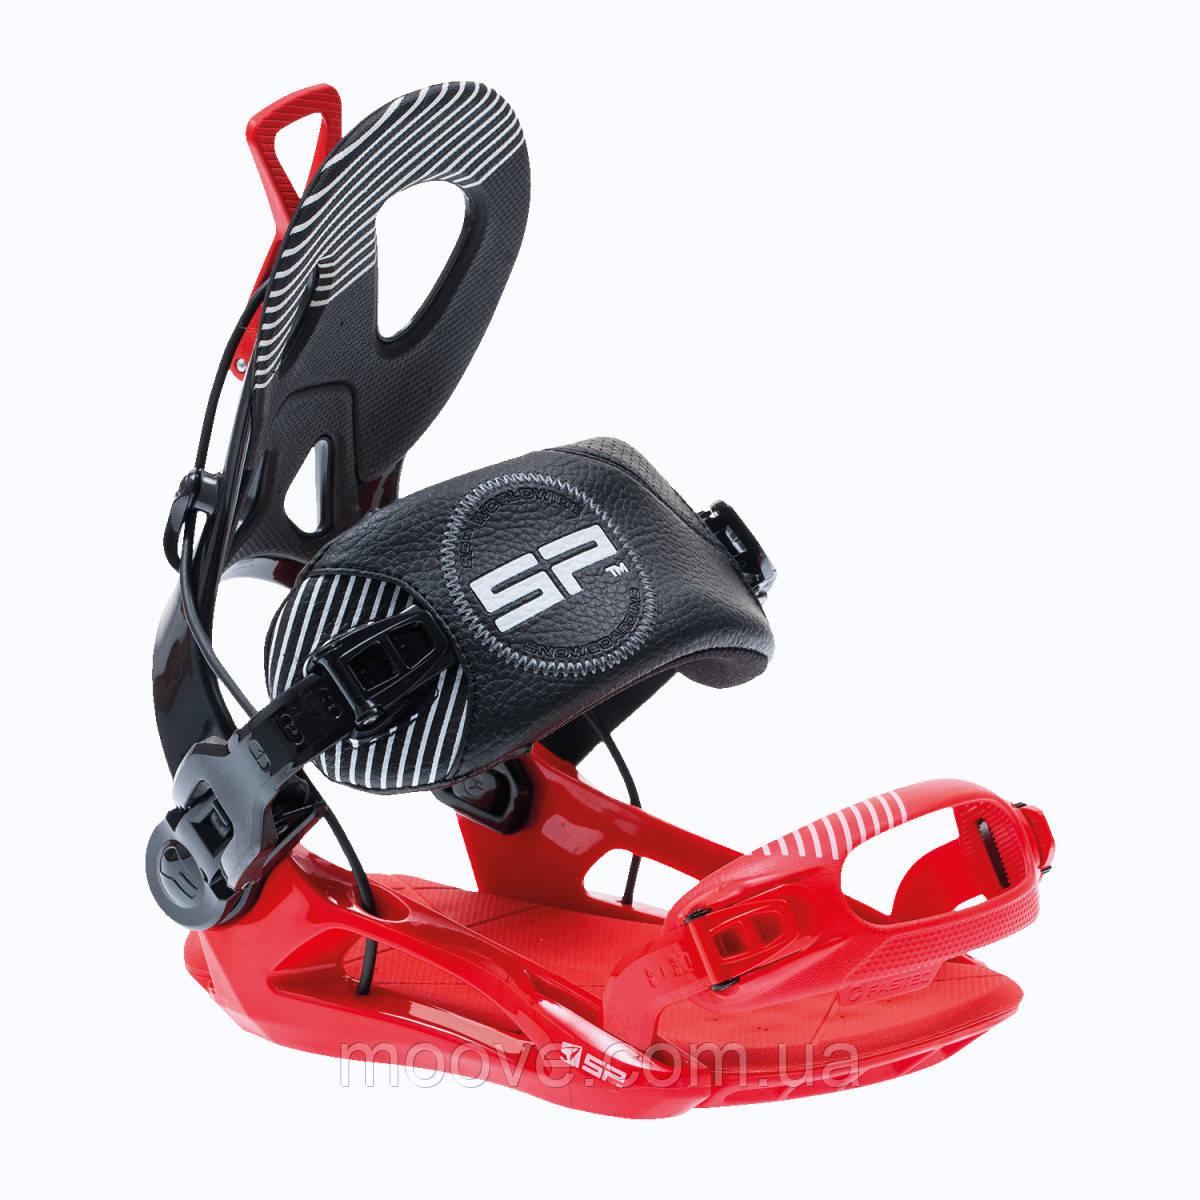 Крепления для сноуборда SP Bindings Fastec Private Black/Red M